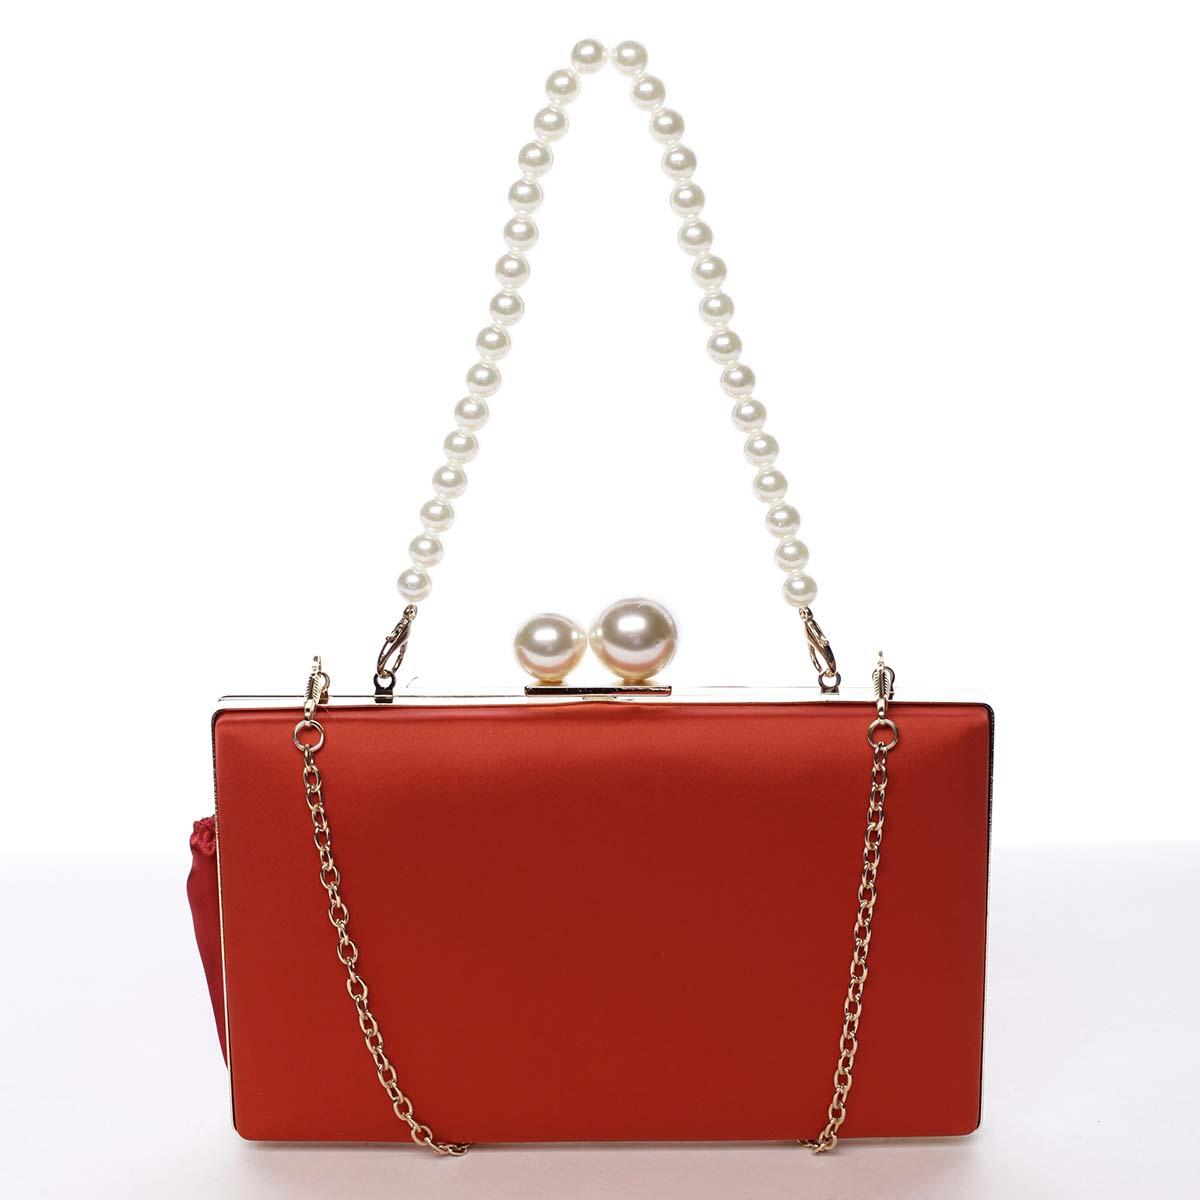 Luxusná dámska saténová listová kabelka s perlami červená - Michelle Moon Seeland